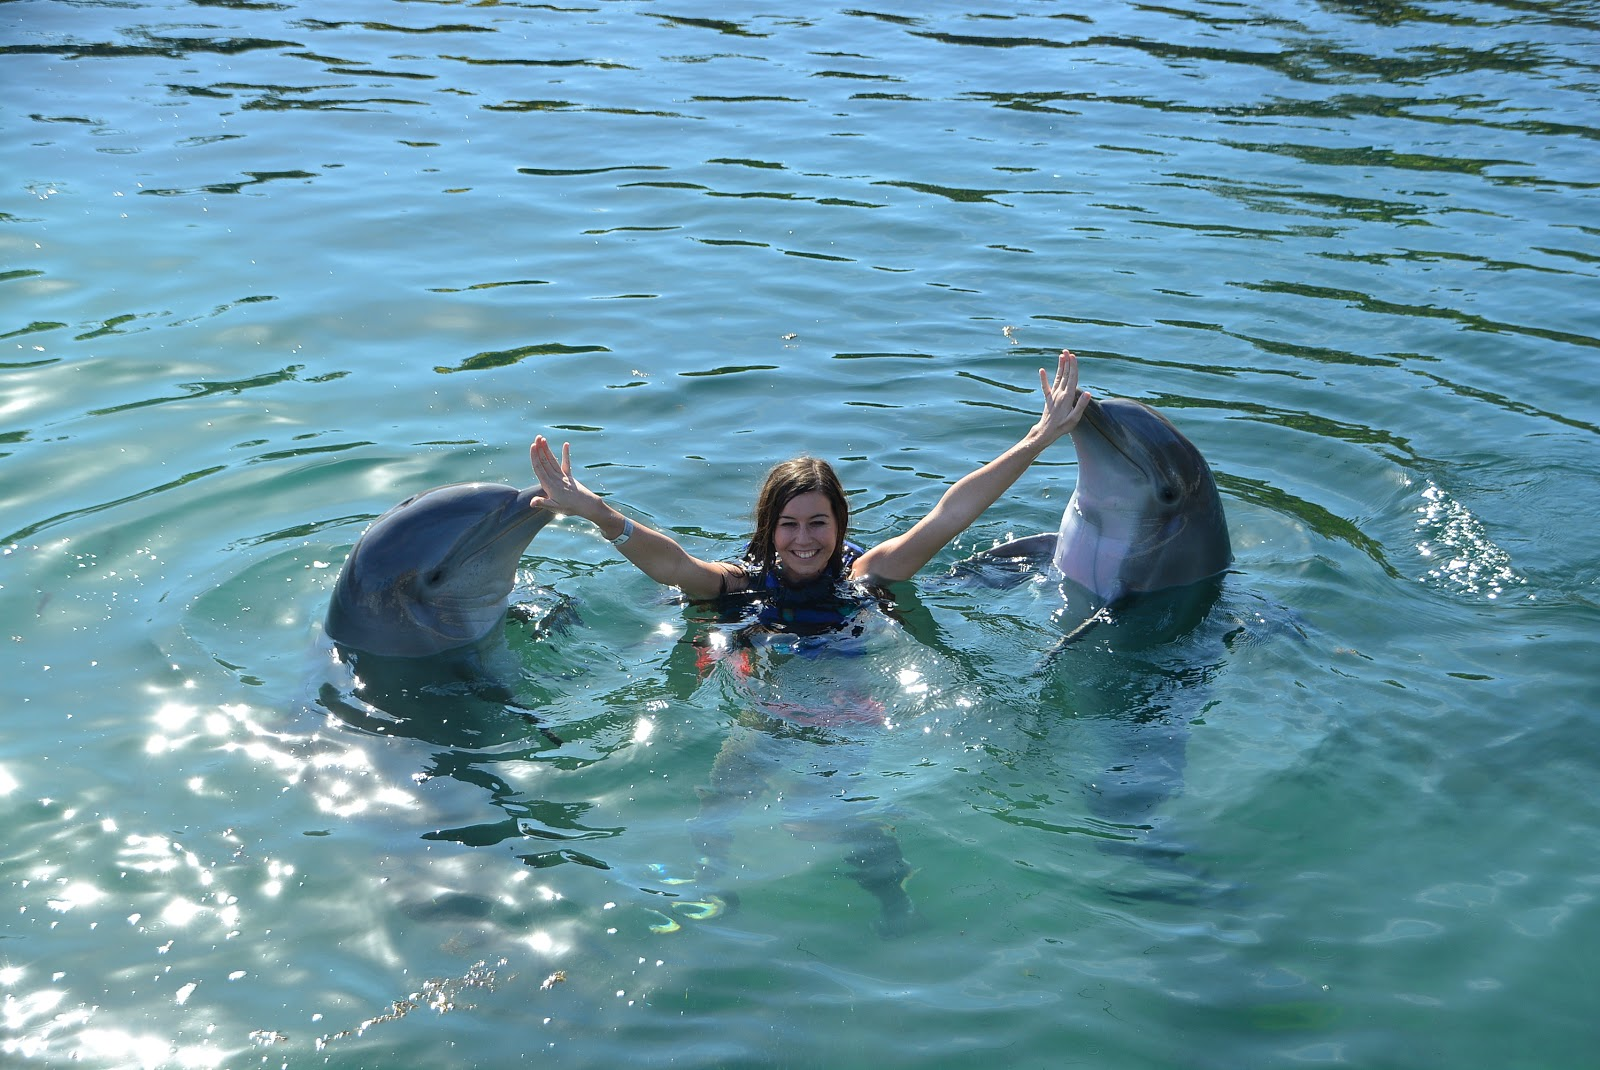 swimming with dolphins, dolphin experience, mexico, mexico vacation, delphinus riviera mava, xcaret, dolphin kisses, dolphin swim, ocean, ocean swimming,